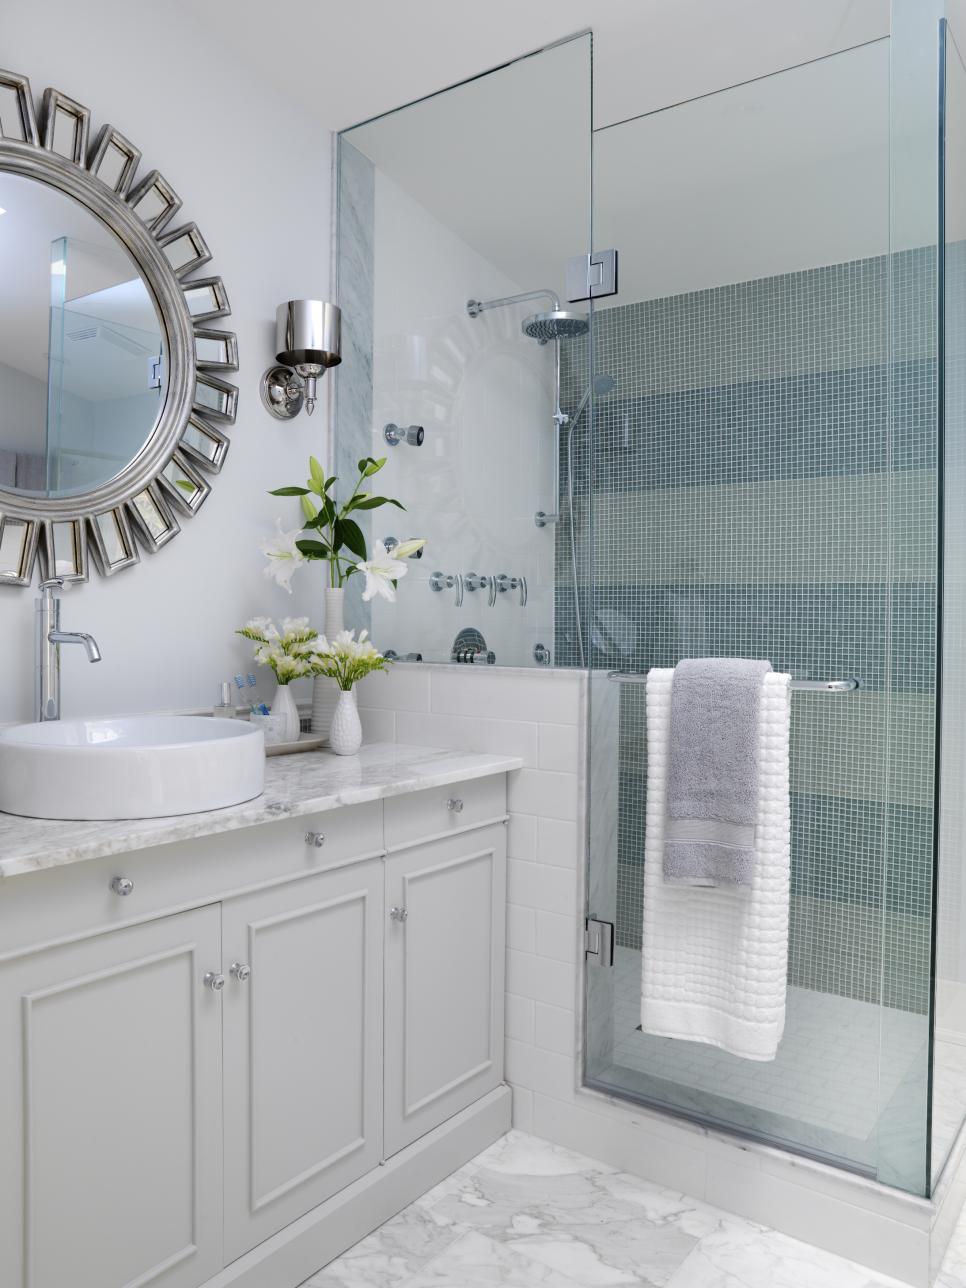 Simply Chic Bathroom Tile Unique Wall Tiles For Bathroom Designs